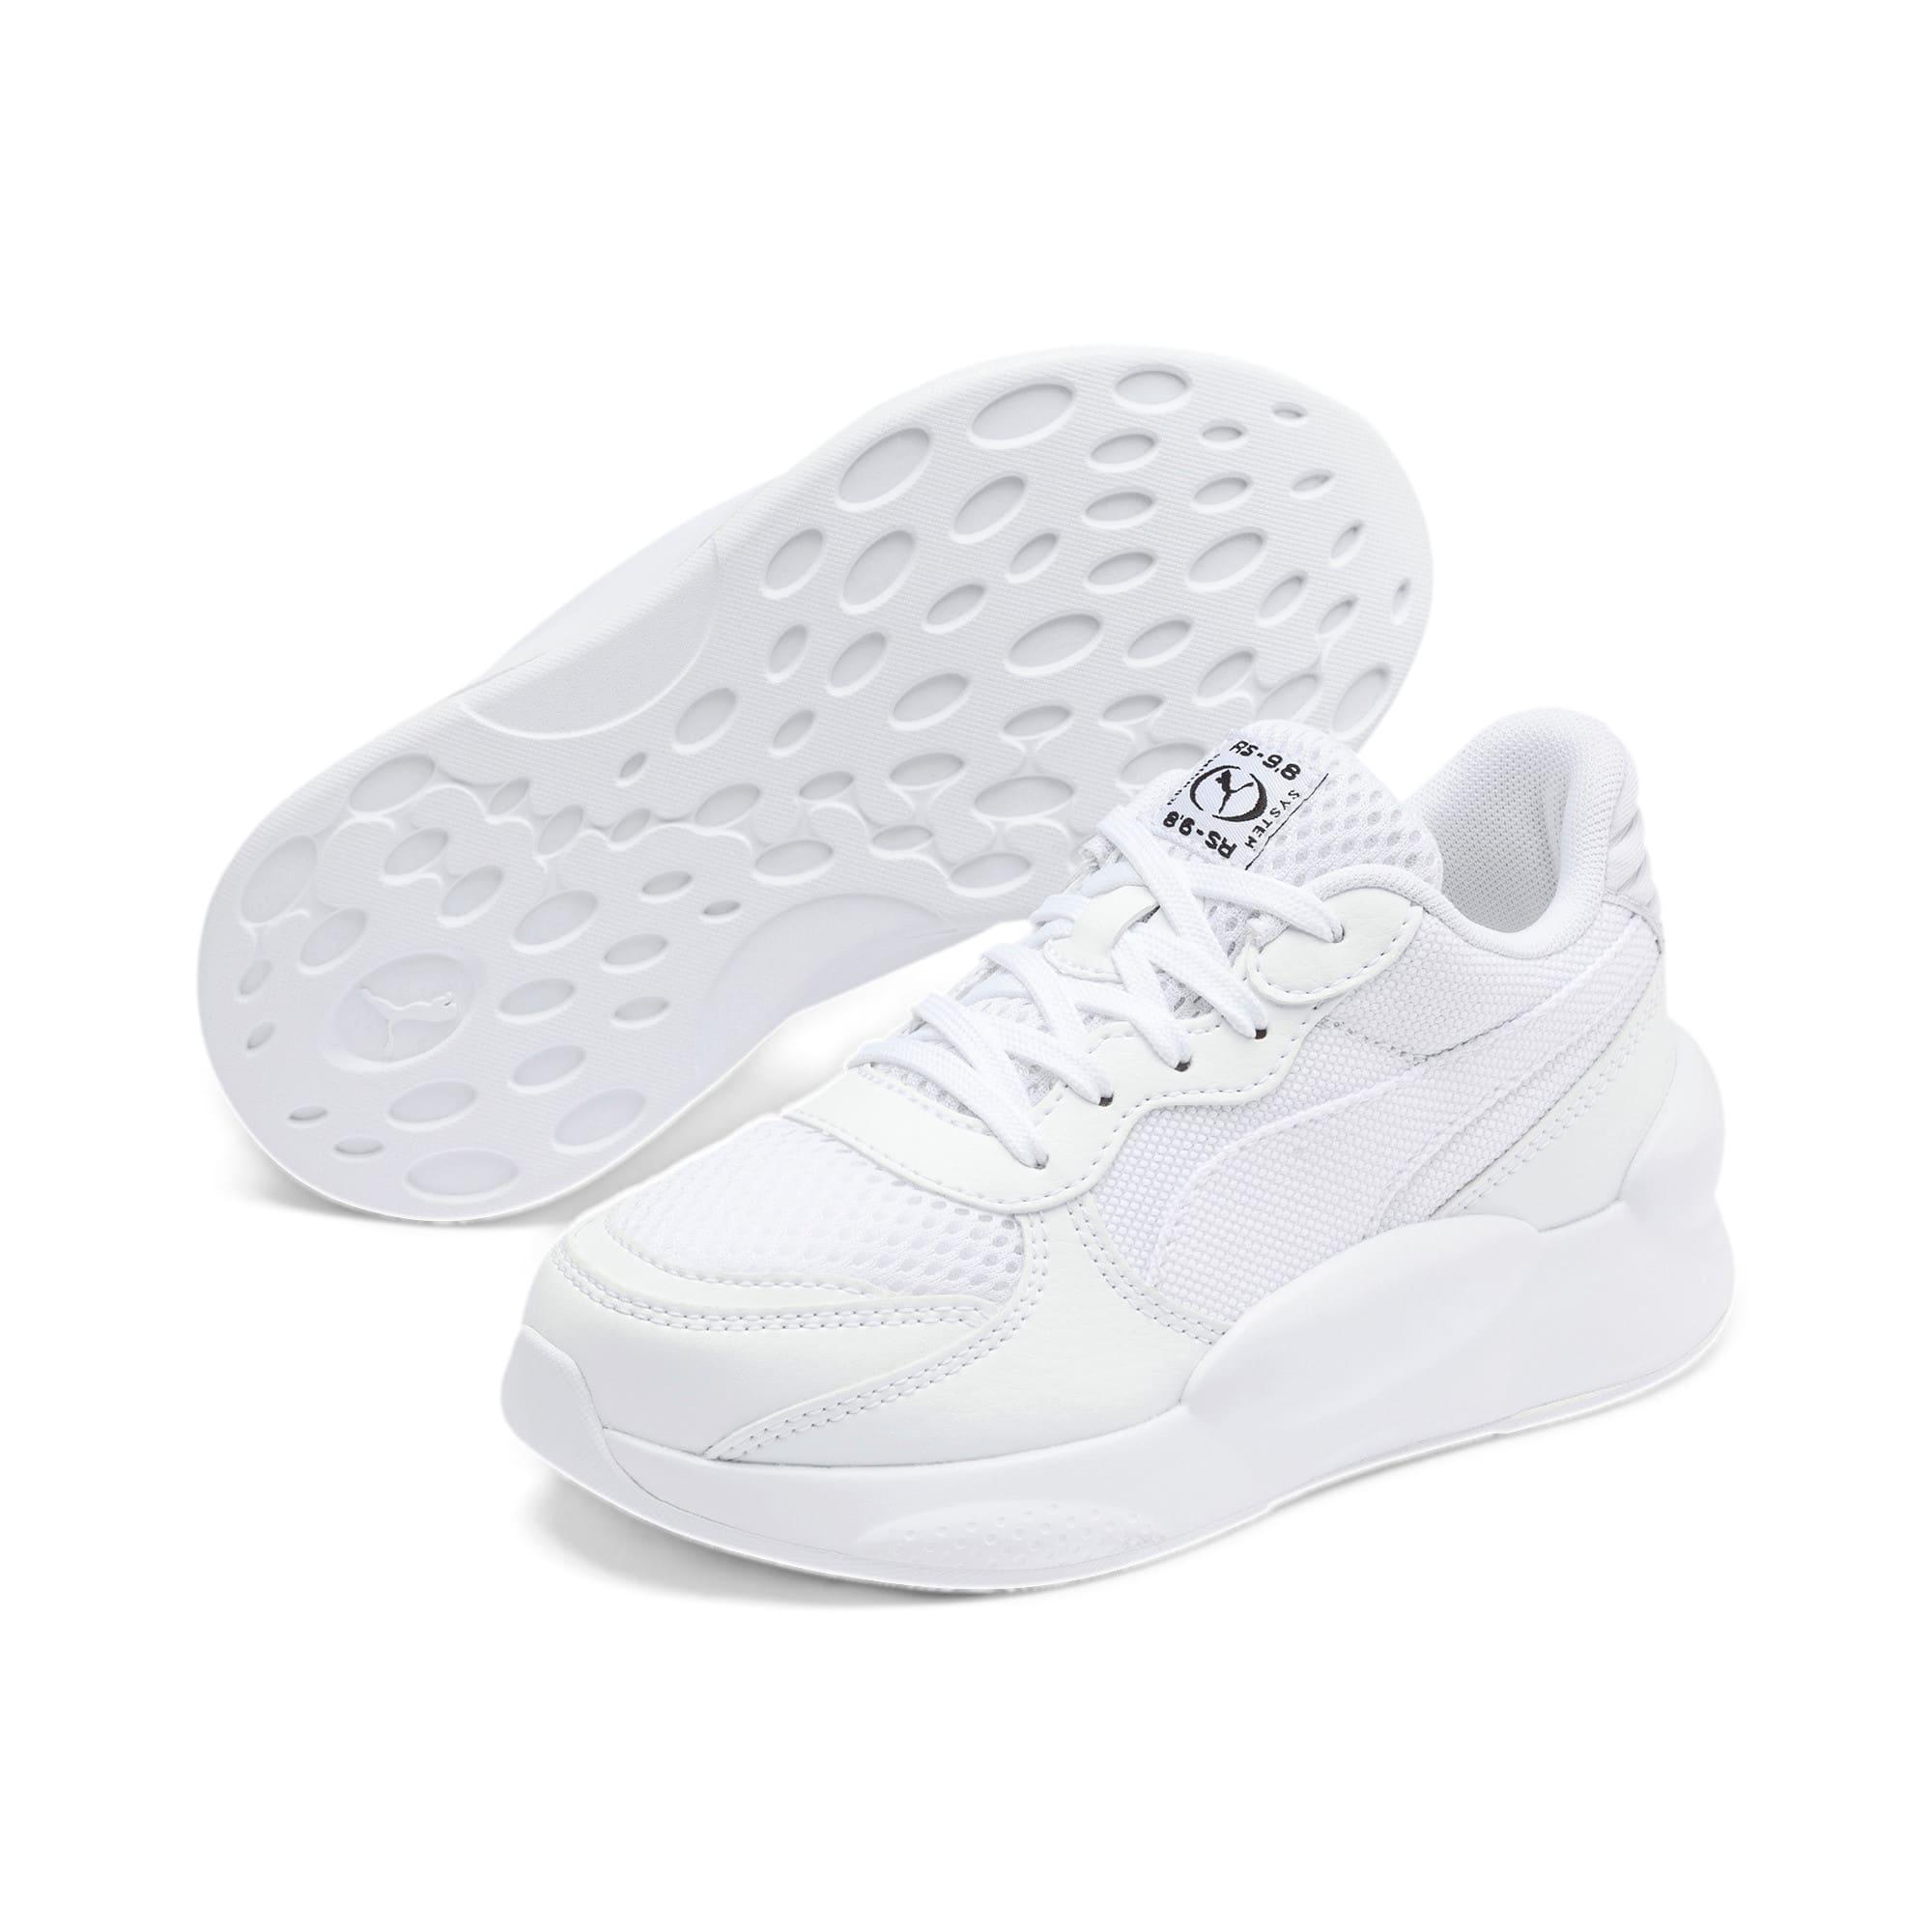 Thumbnail 2 of RS 9.8 Core Little Kids' Shoes, Puma White, medium